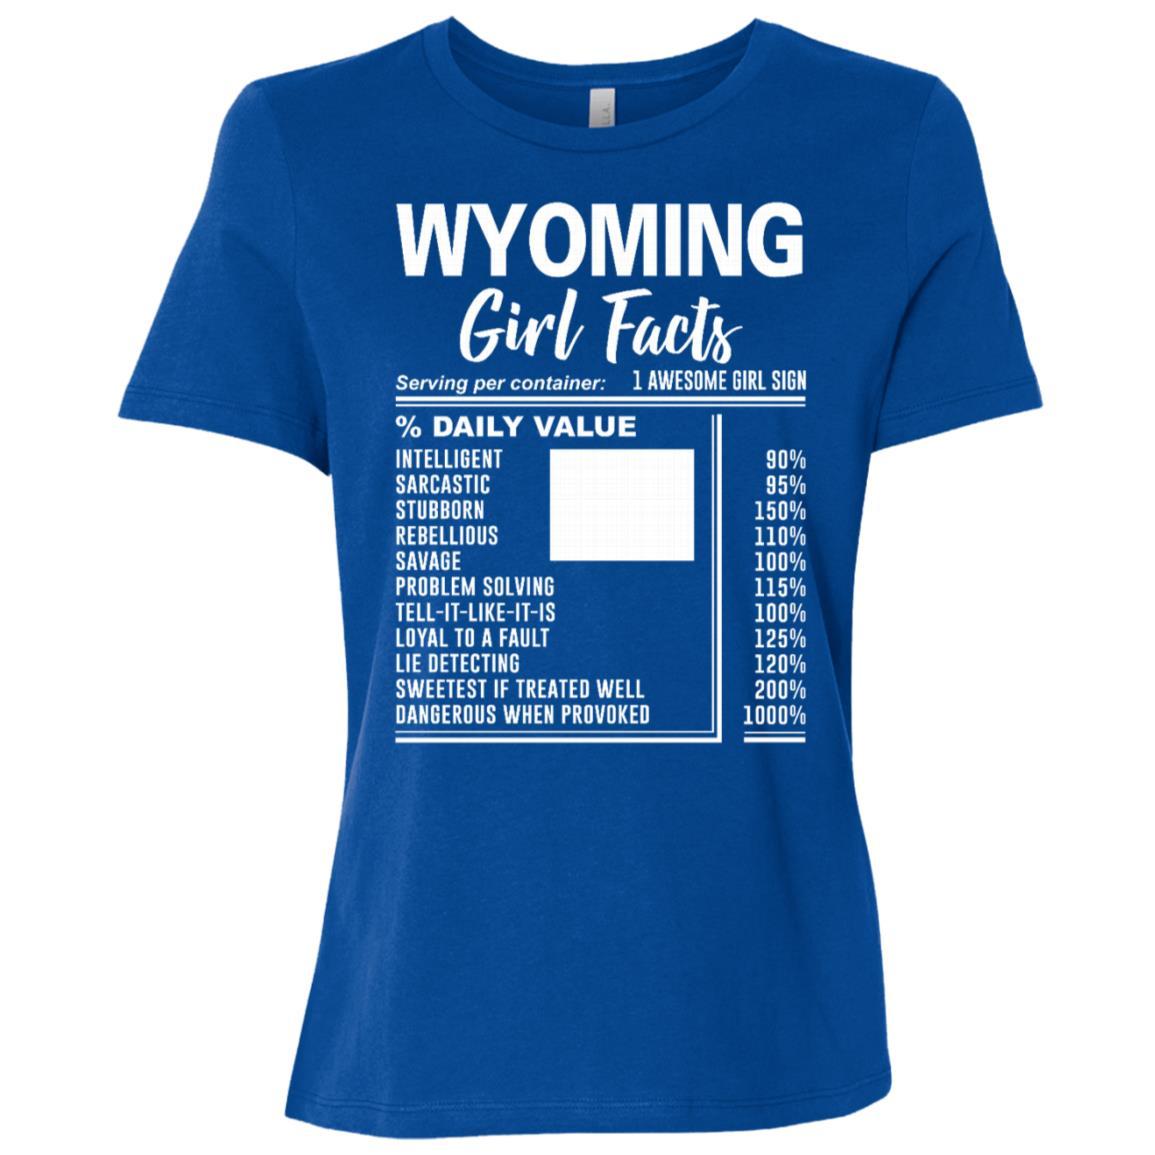 Born in Wyoming – Wyoming Girl Facts Women Short Sleeve T-Shirt